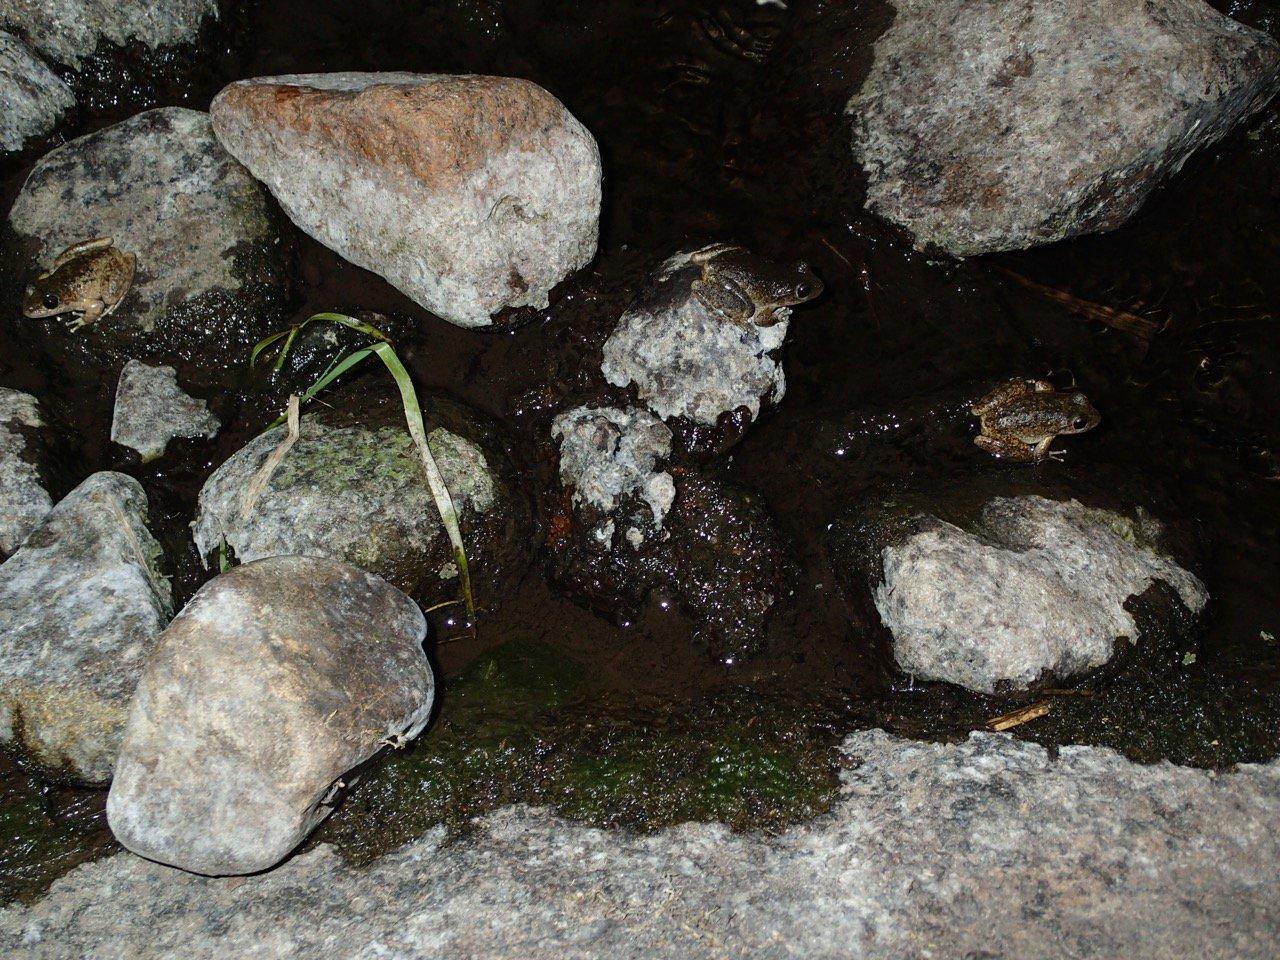 Three Booroolong Frog (Litoria booroolongensis)